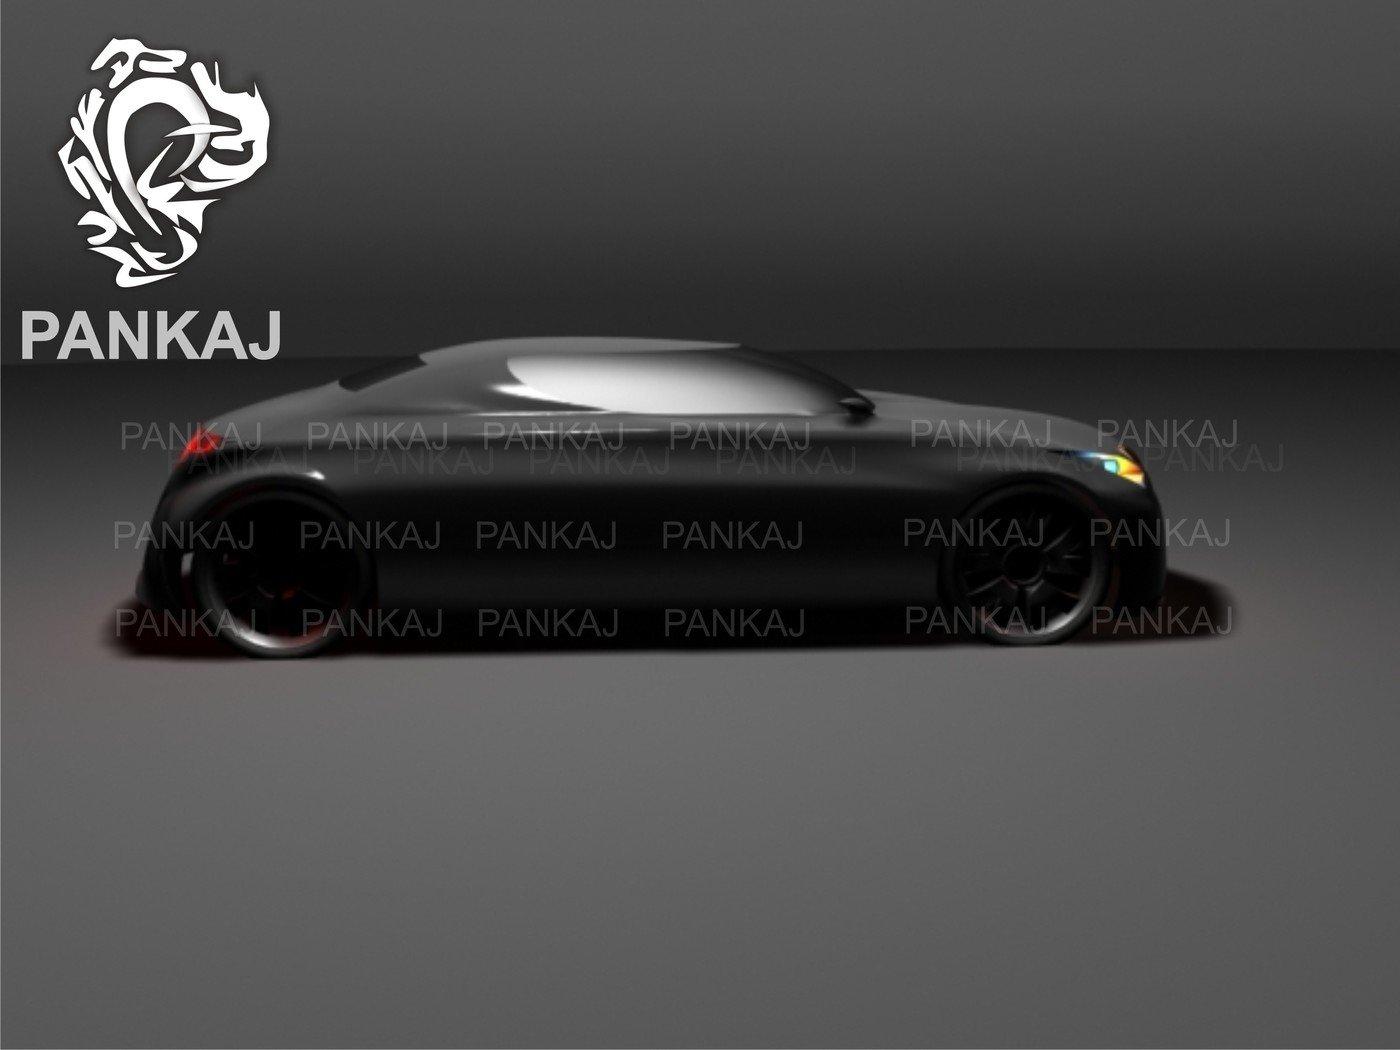 3d image by pankaj jagad at Coroflot com